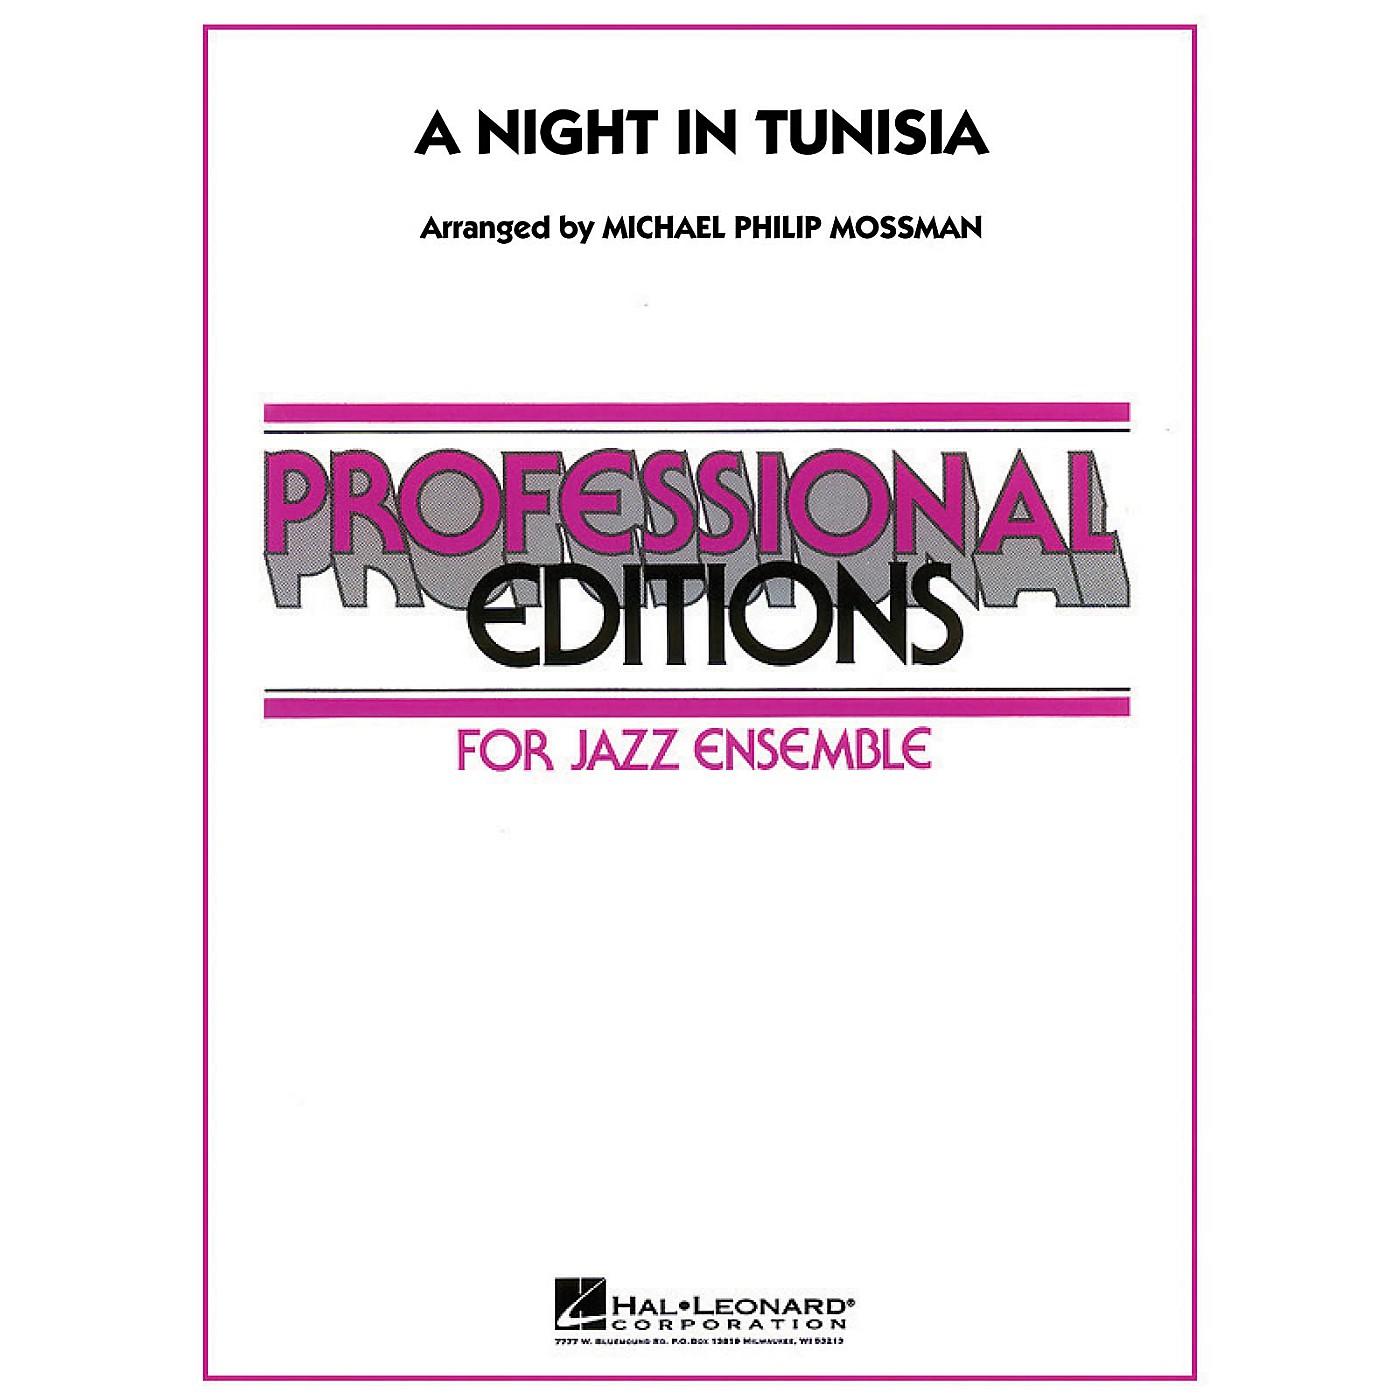 Hal Leonard A Night in Tunisia Jazz Band Level 5 Arranged by Michael Philip Mossman thumbnail